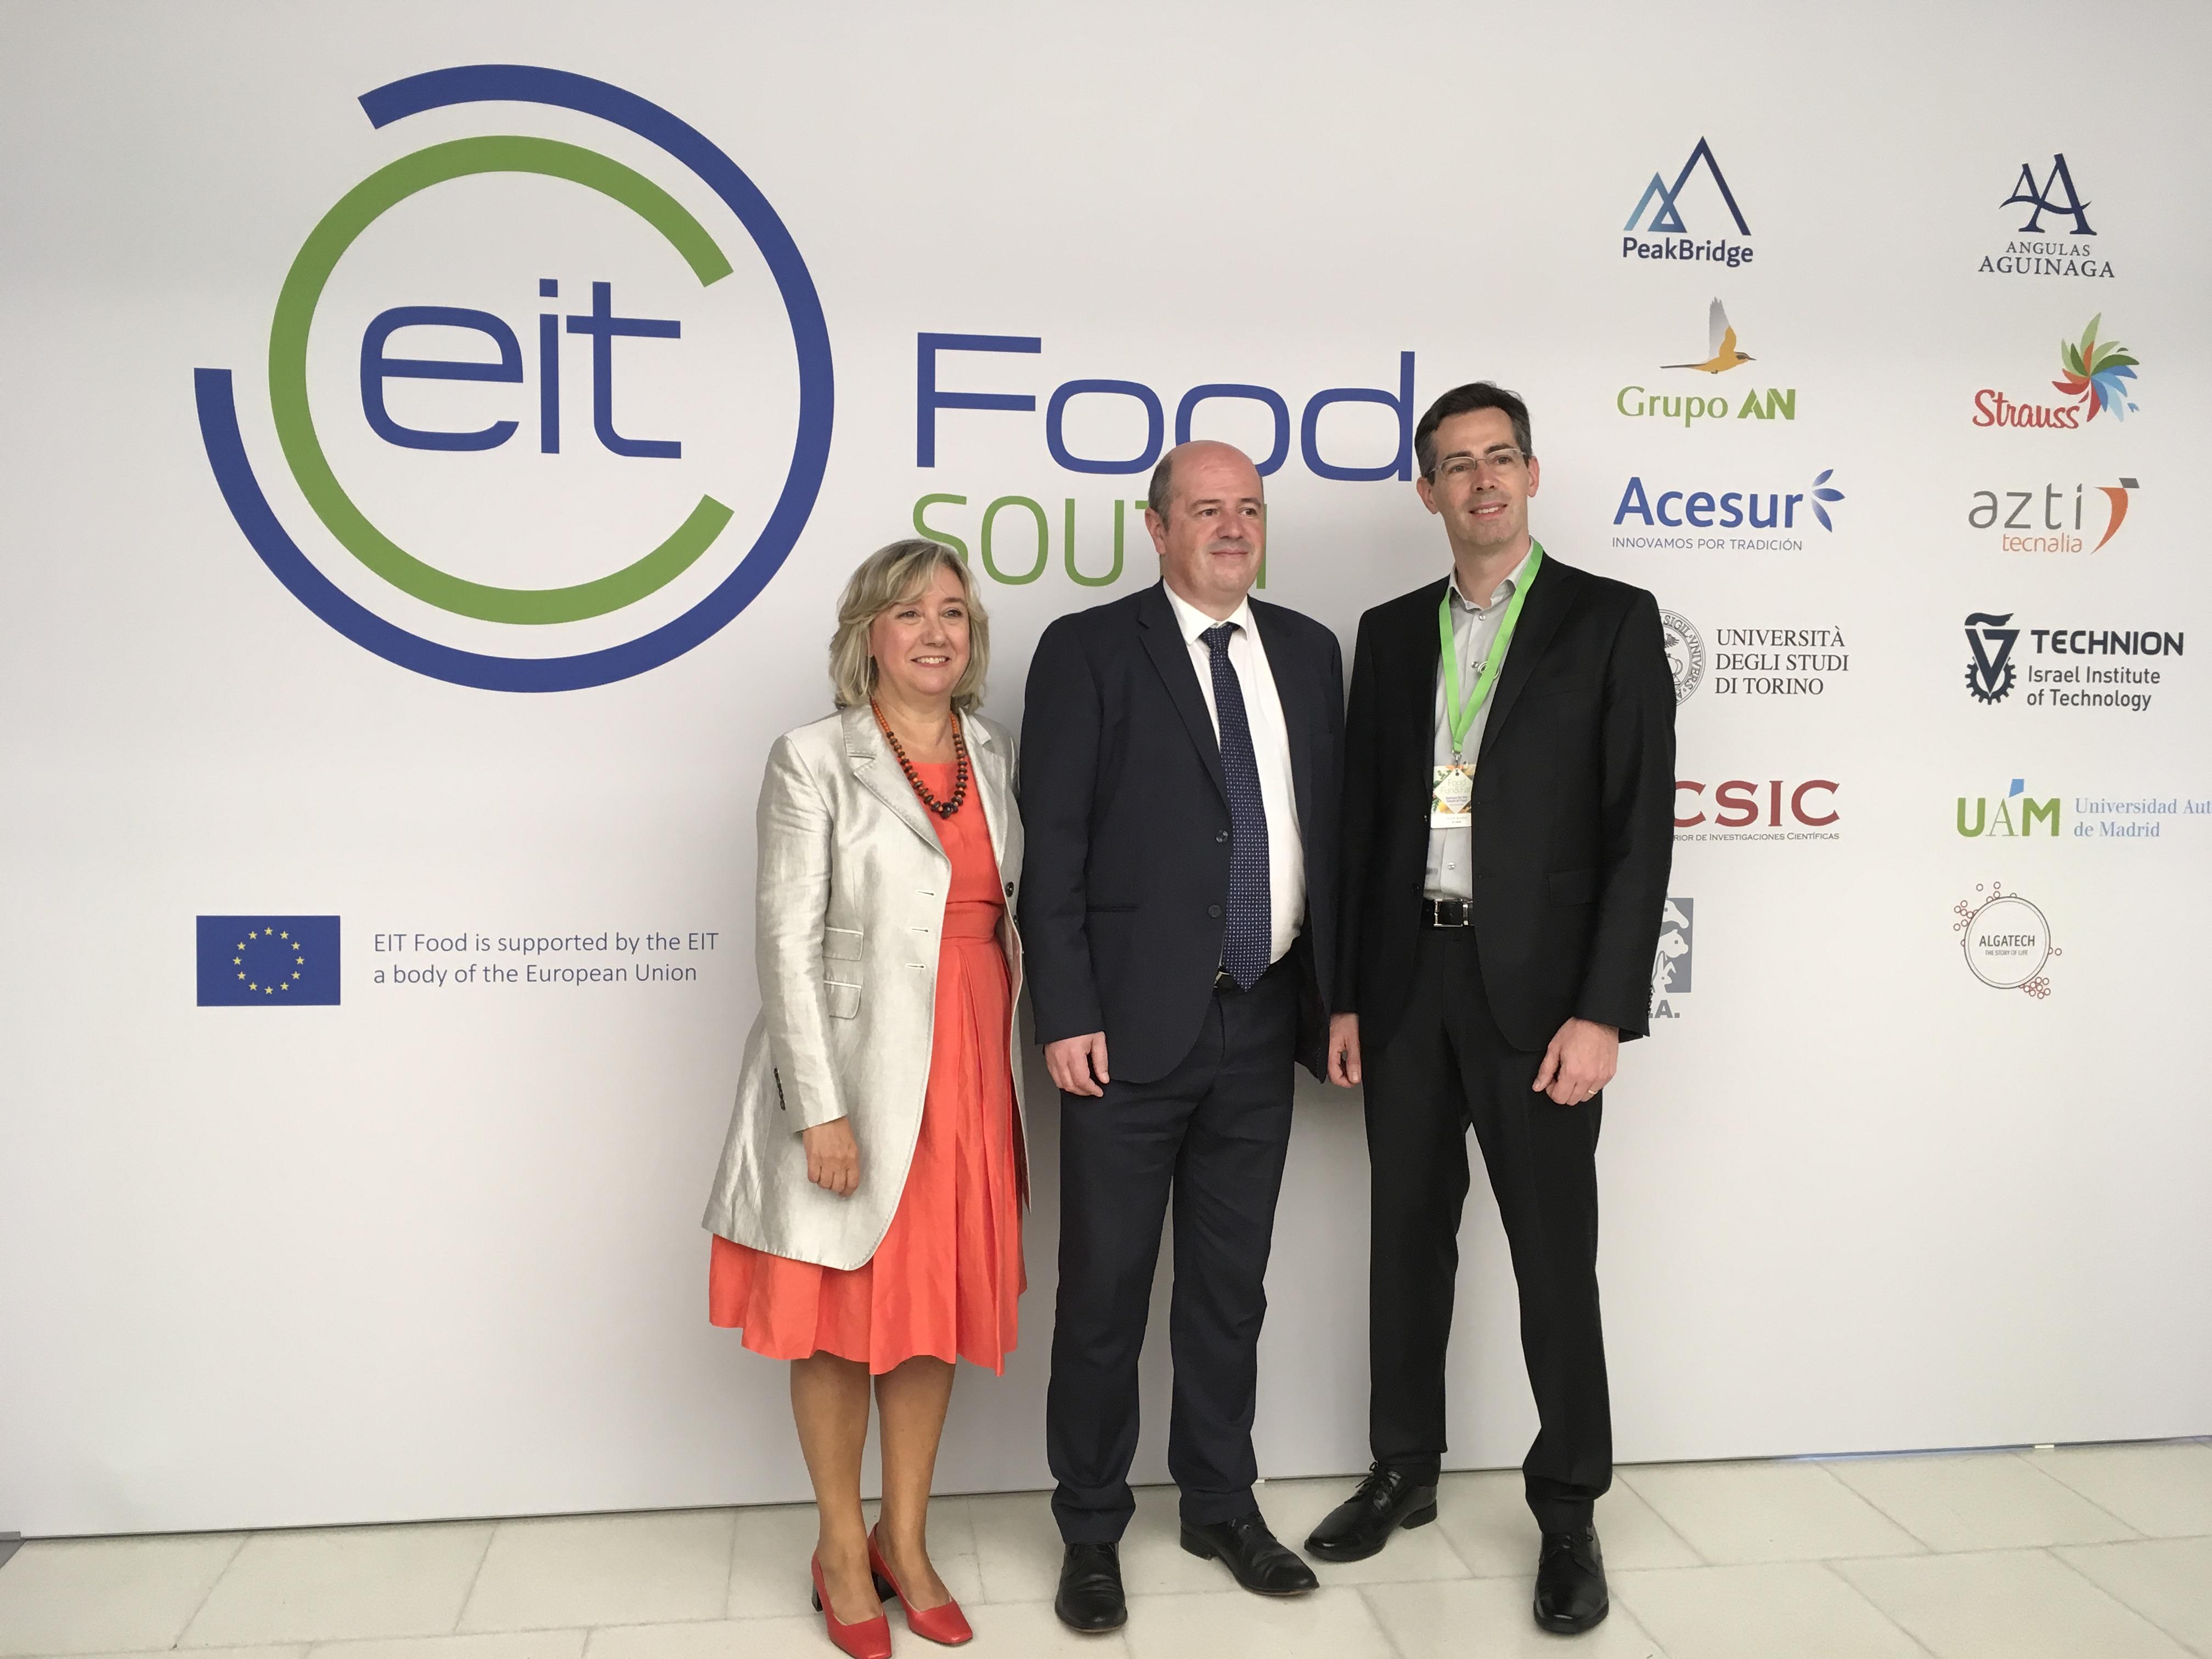 EIT_Food_1.JPG